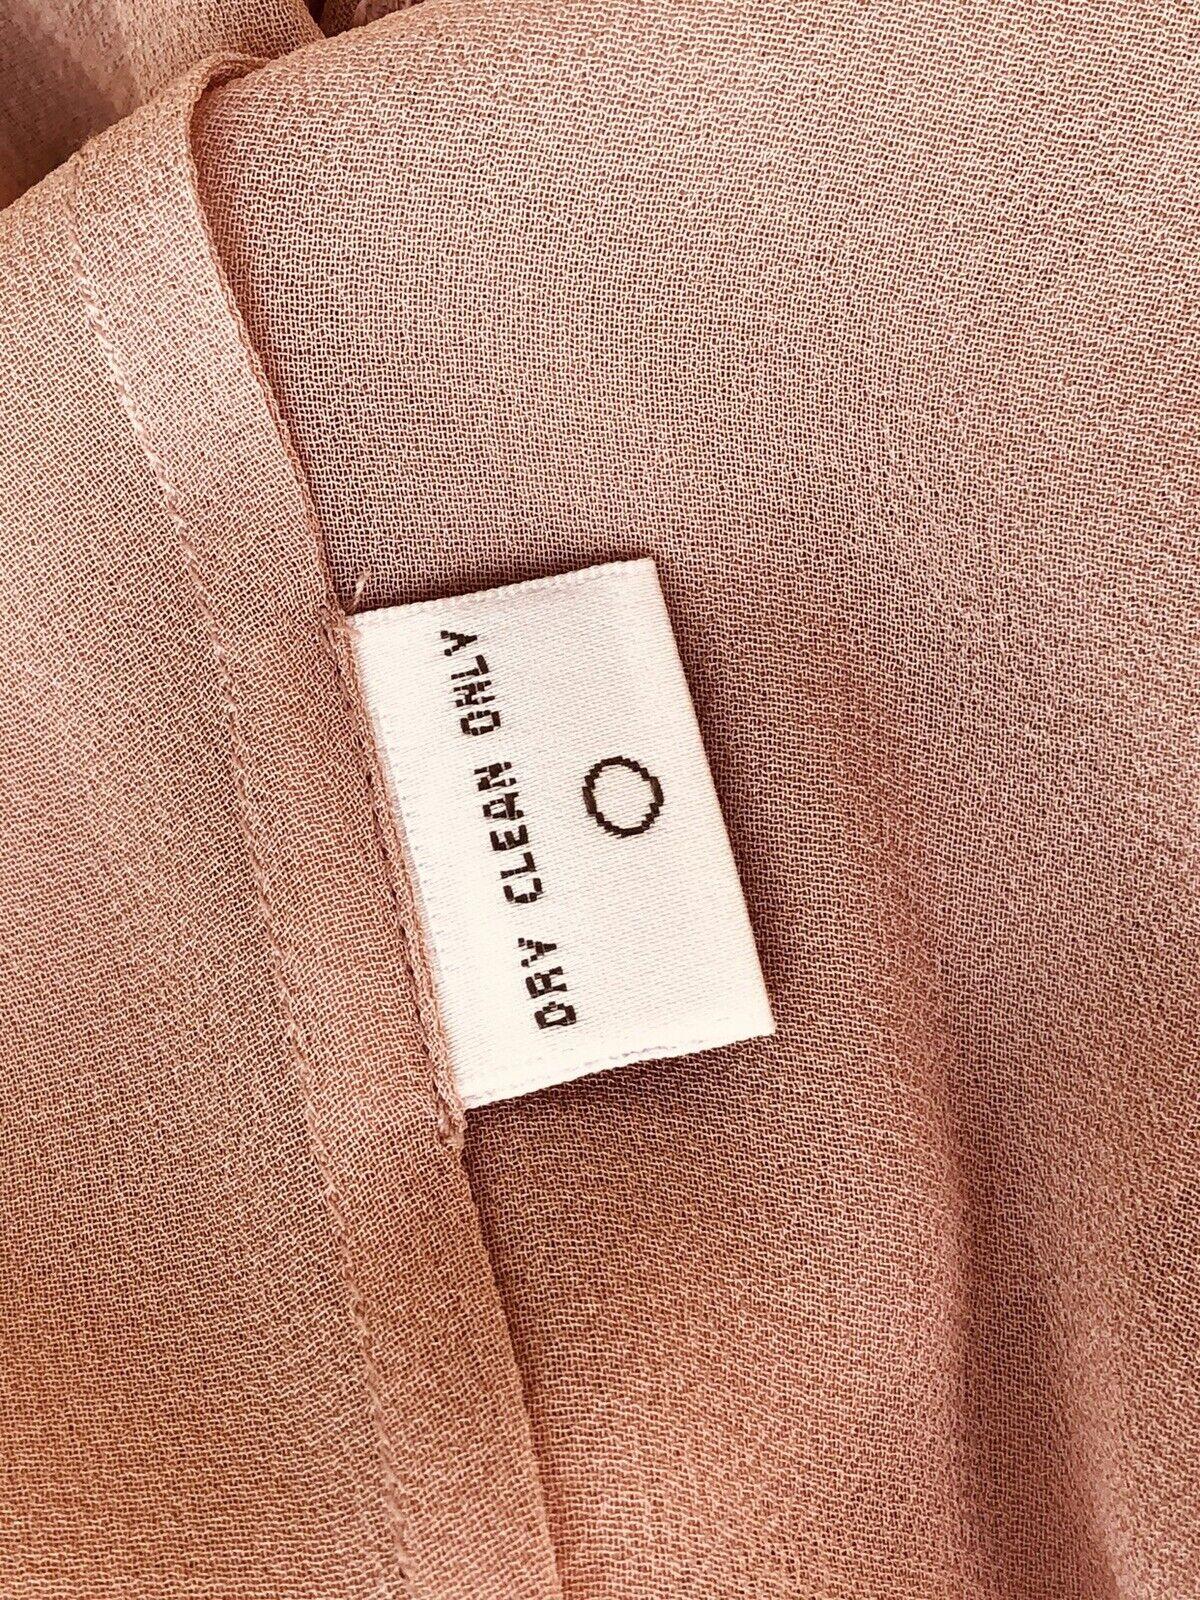 Vintage Stunning Jones Wear Silk Sheer Dusty Lila… - image 7